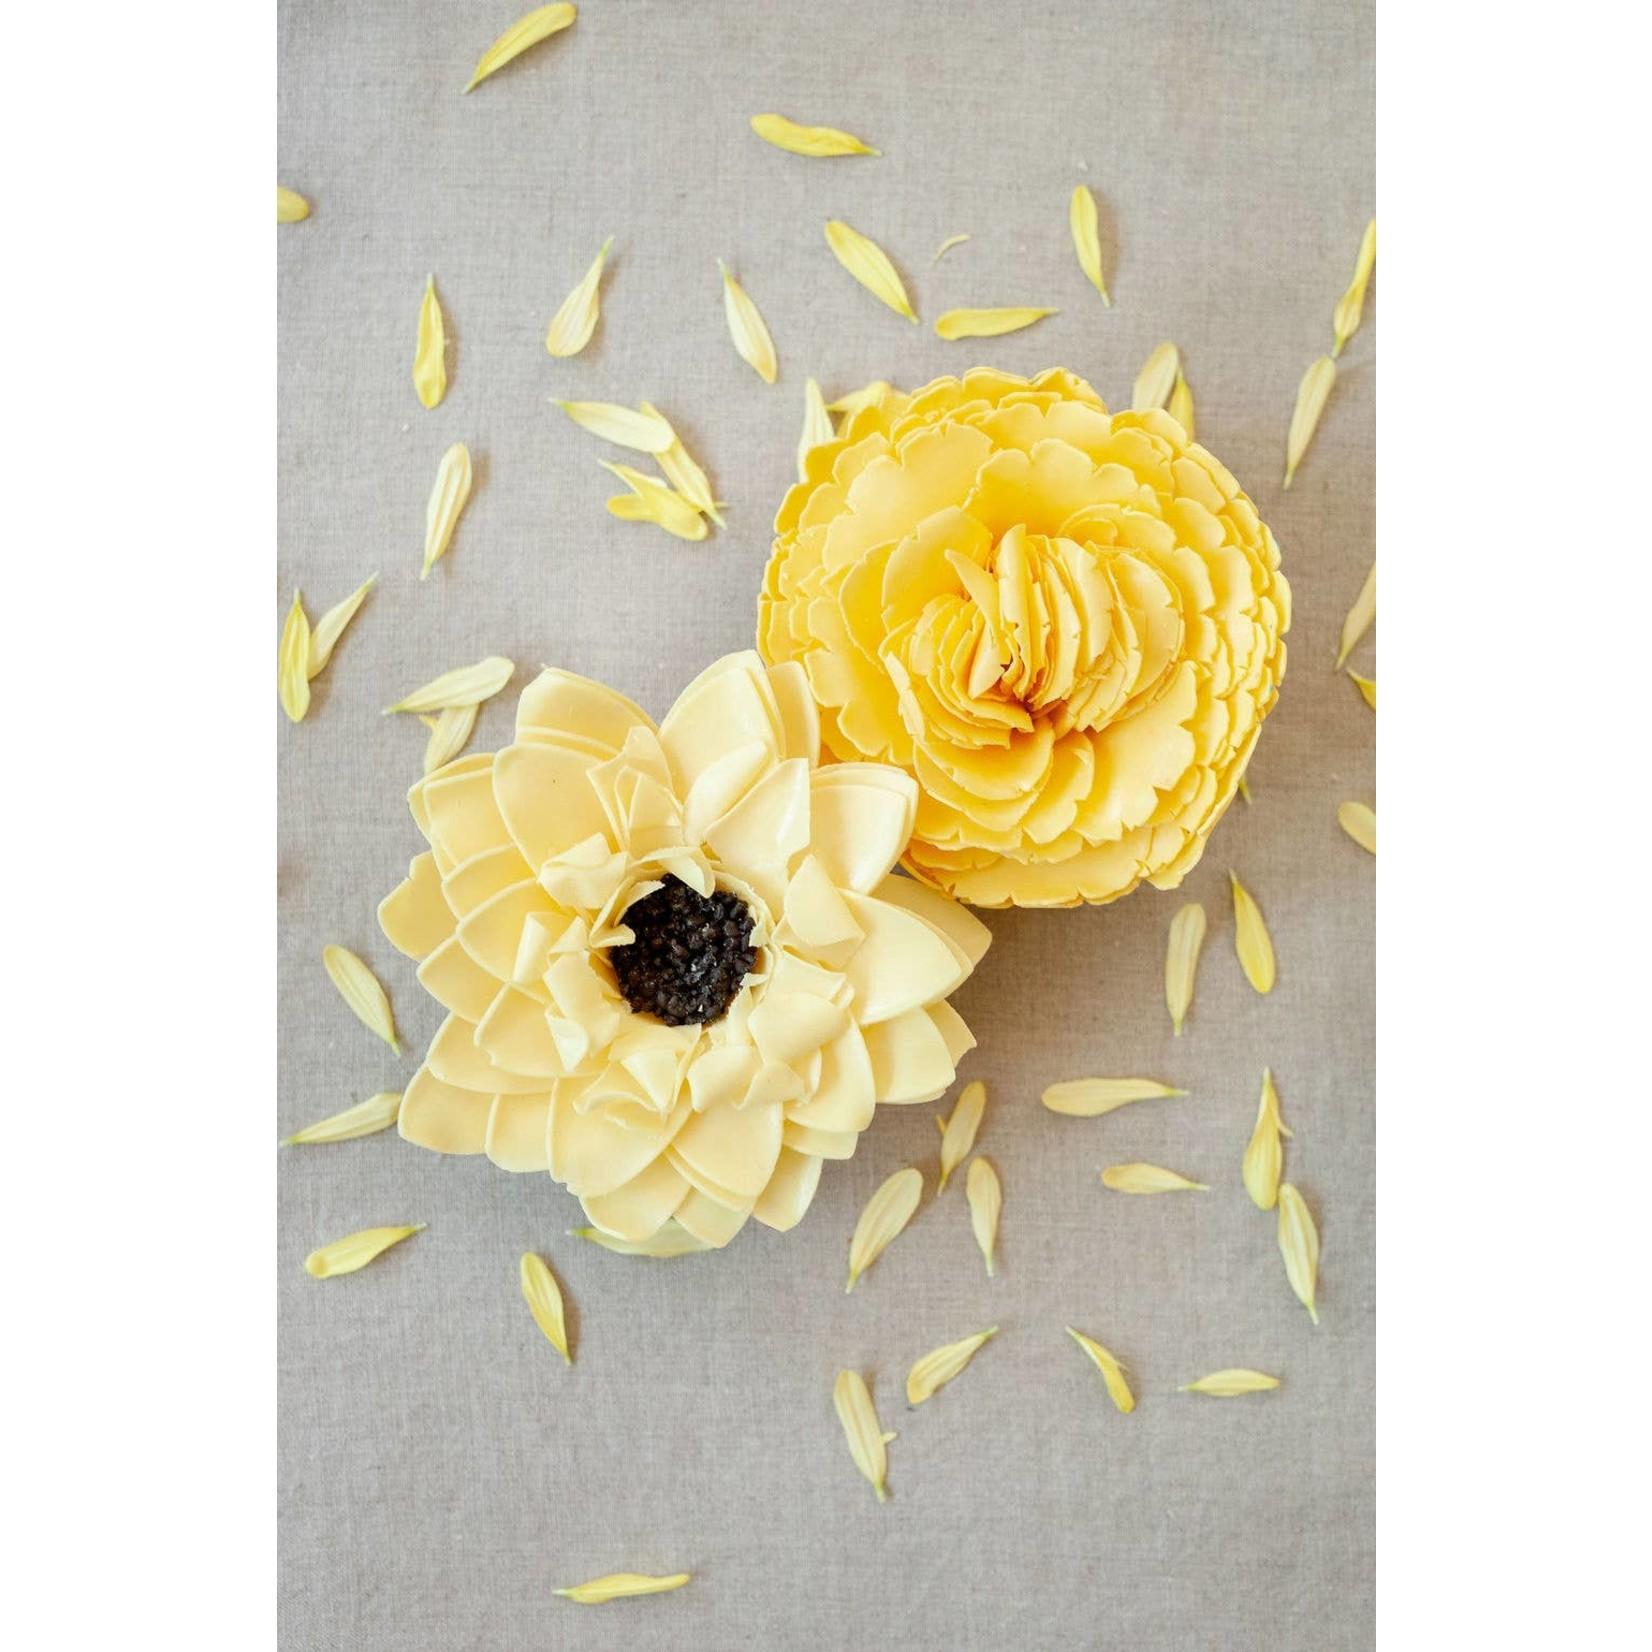 A'marie's Bath Flower Shop Sunny Days Bathing Petal Soap Flower